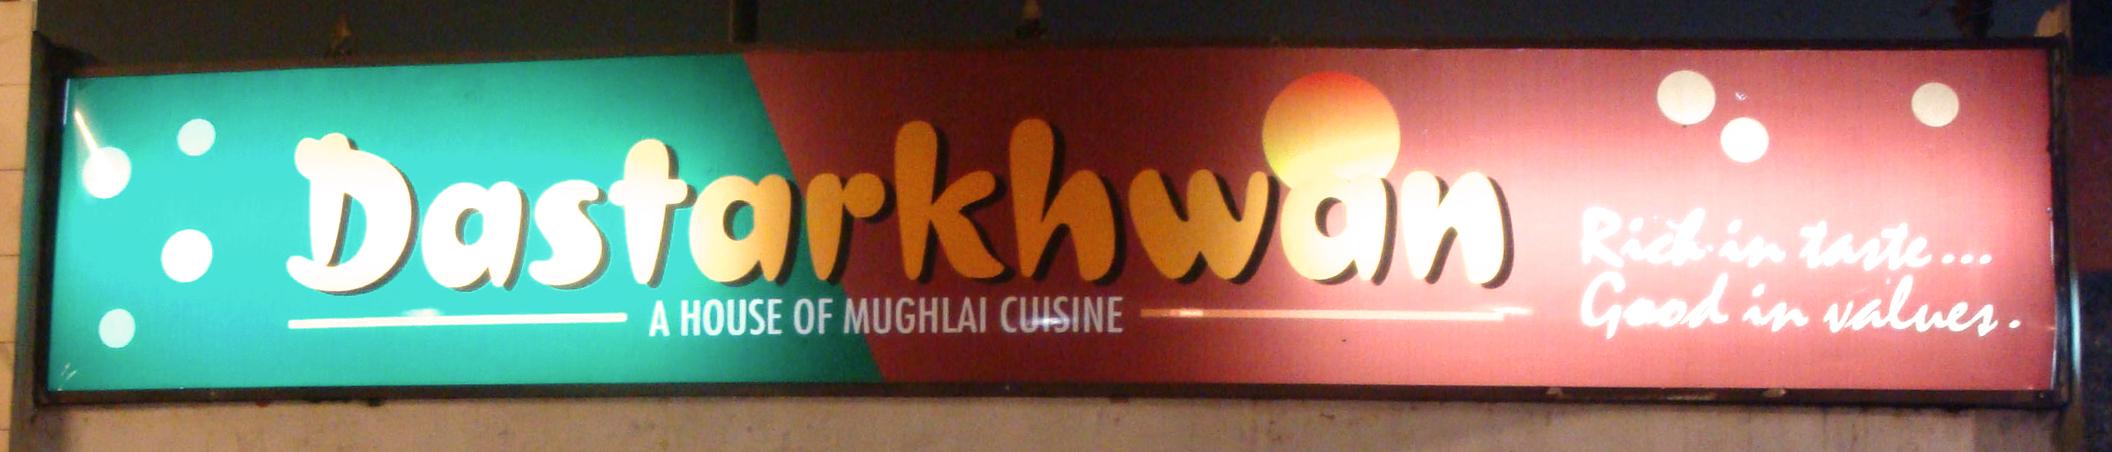 dastarkhwan signage Lucknow food kabab kebab